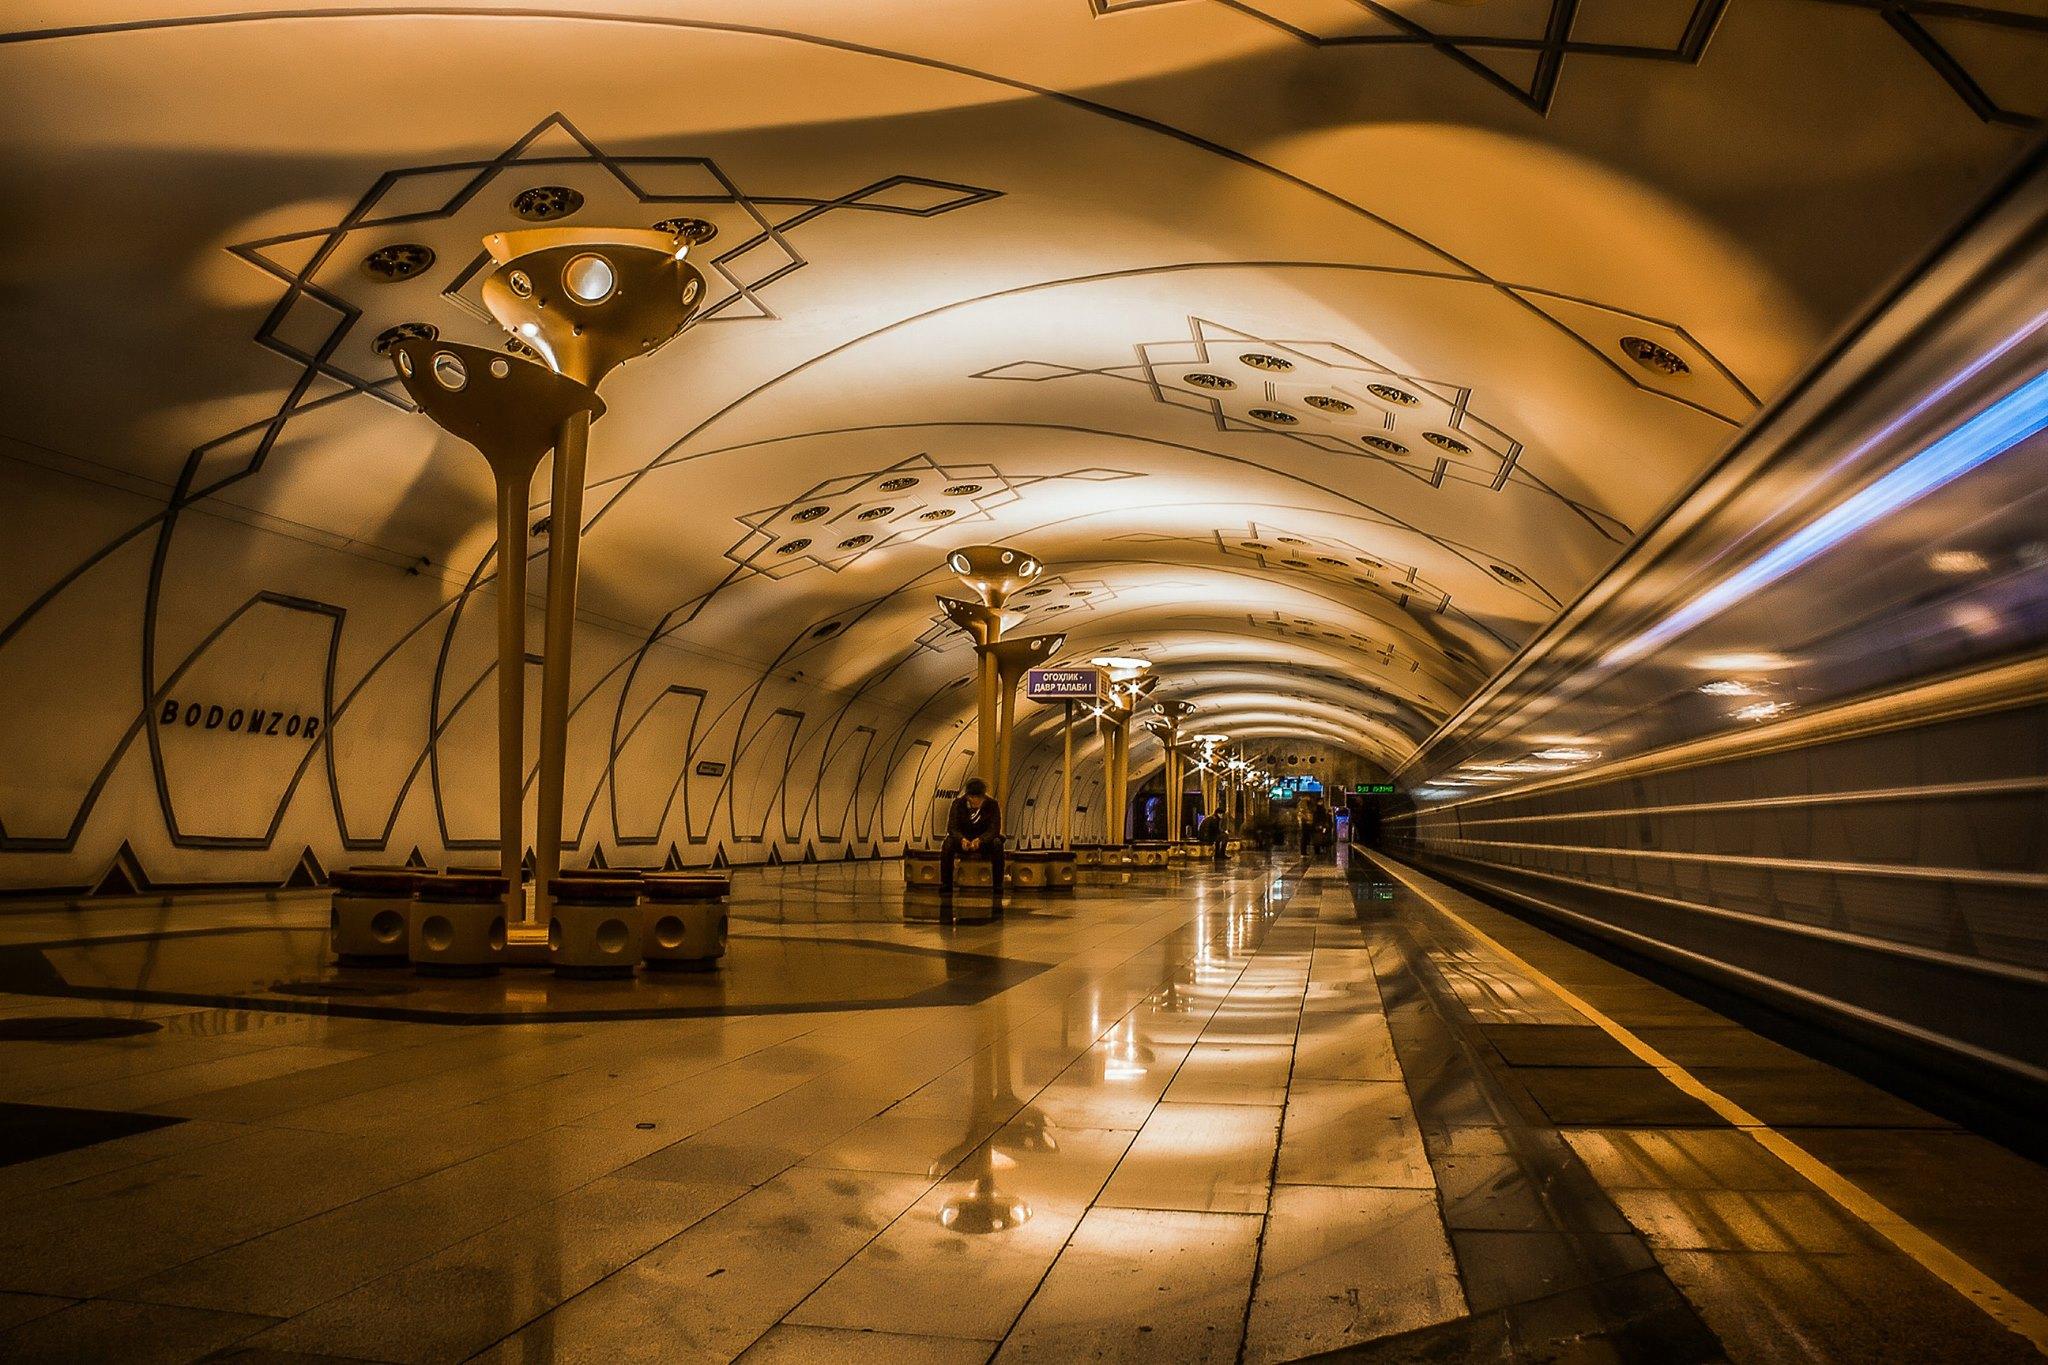 время узнать, ташкентский метрополитен фото них красивое веретеновидное